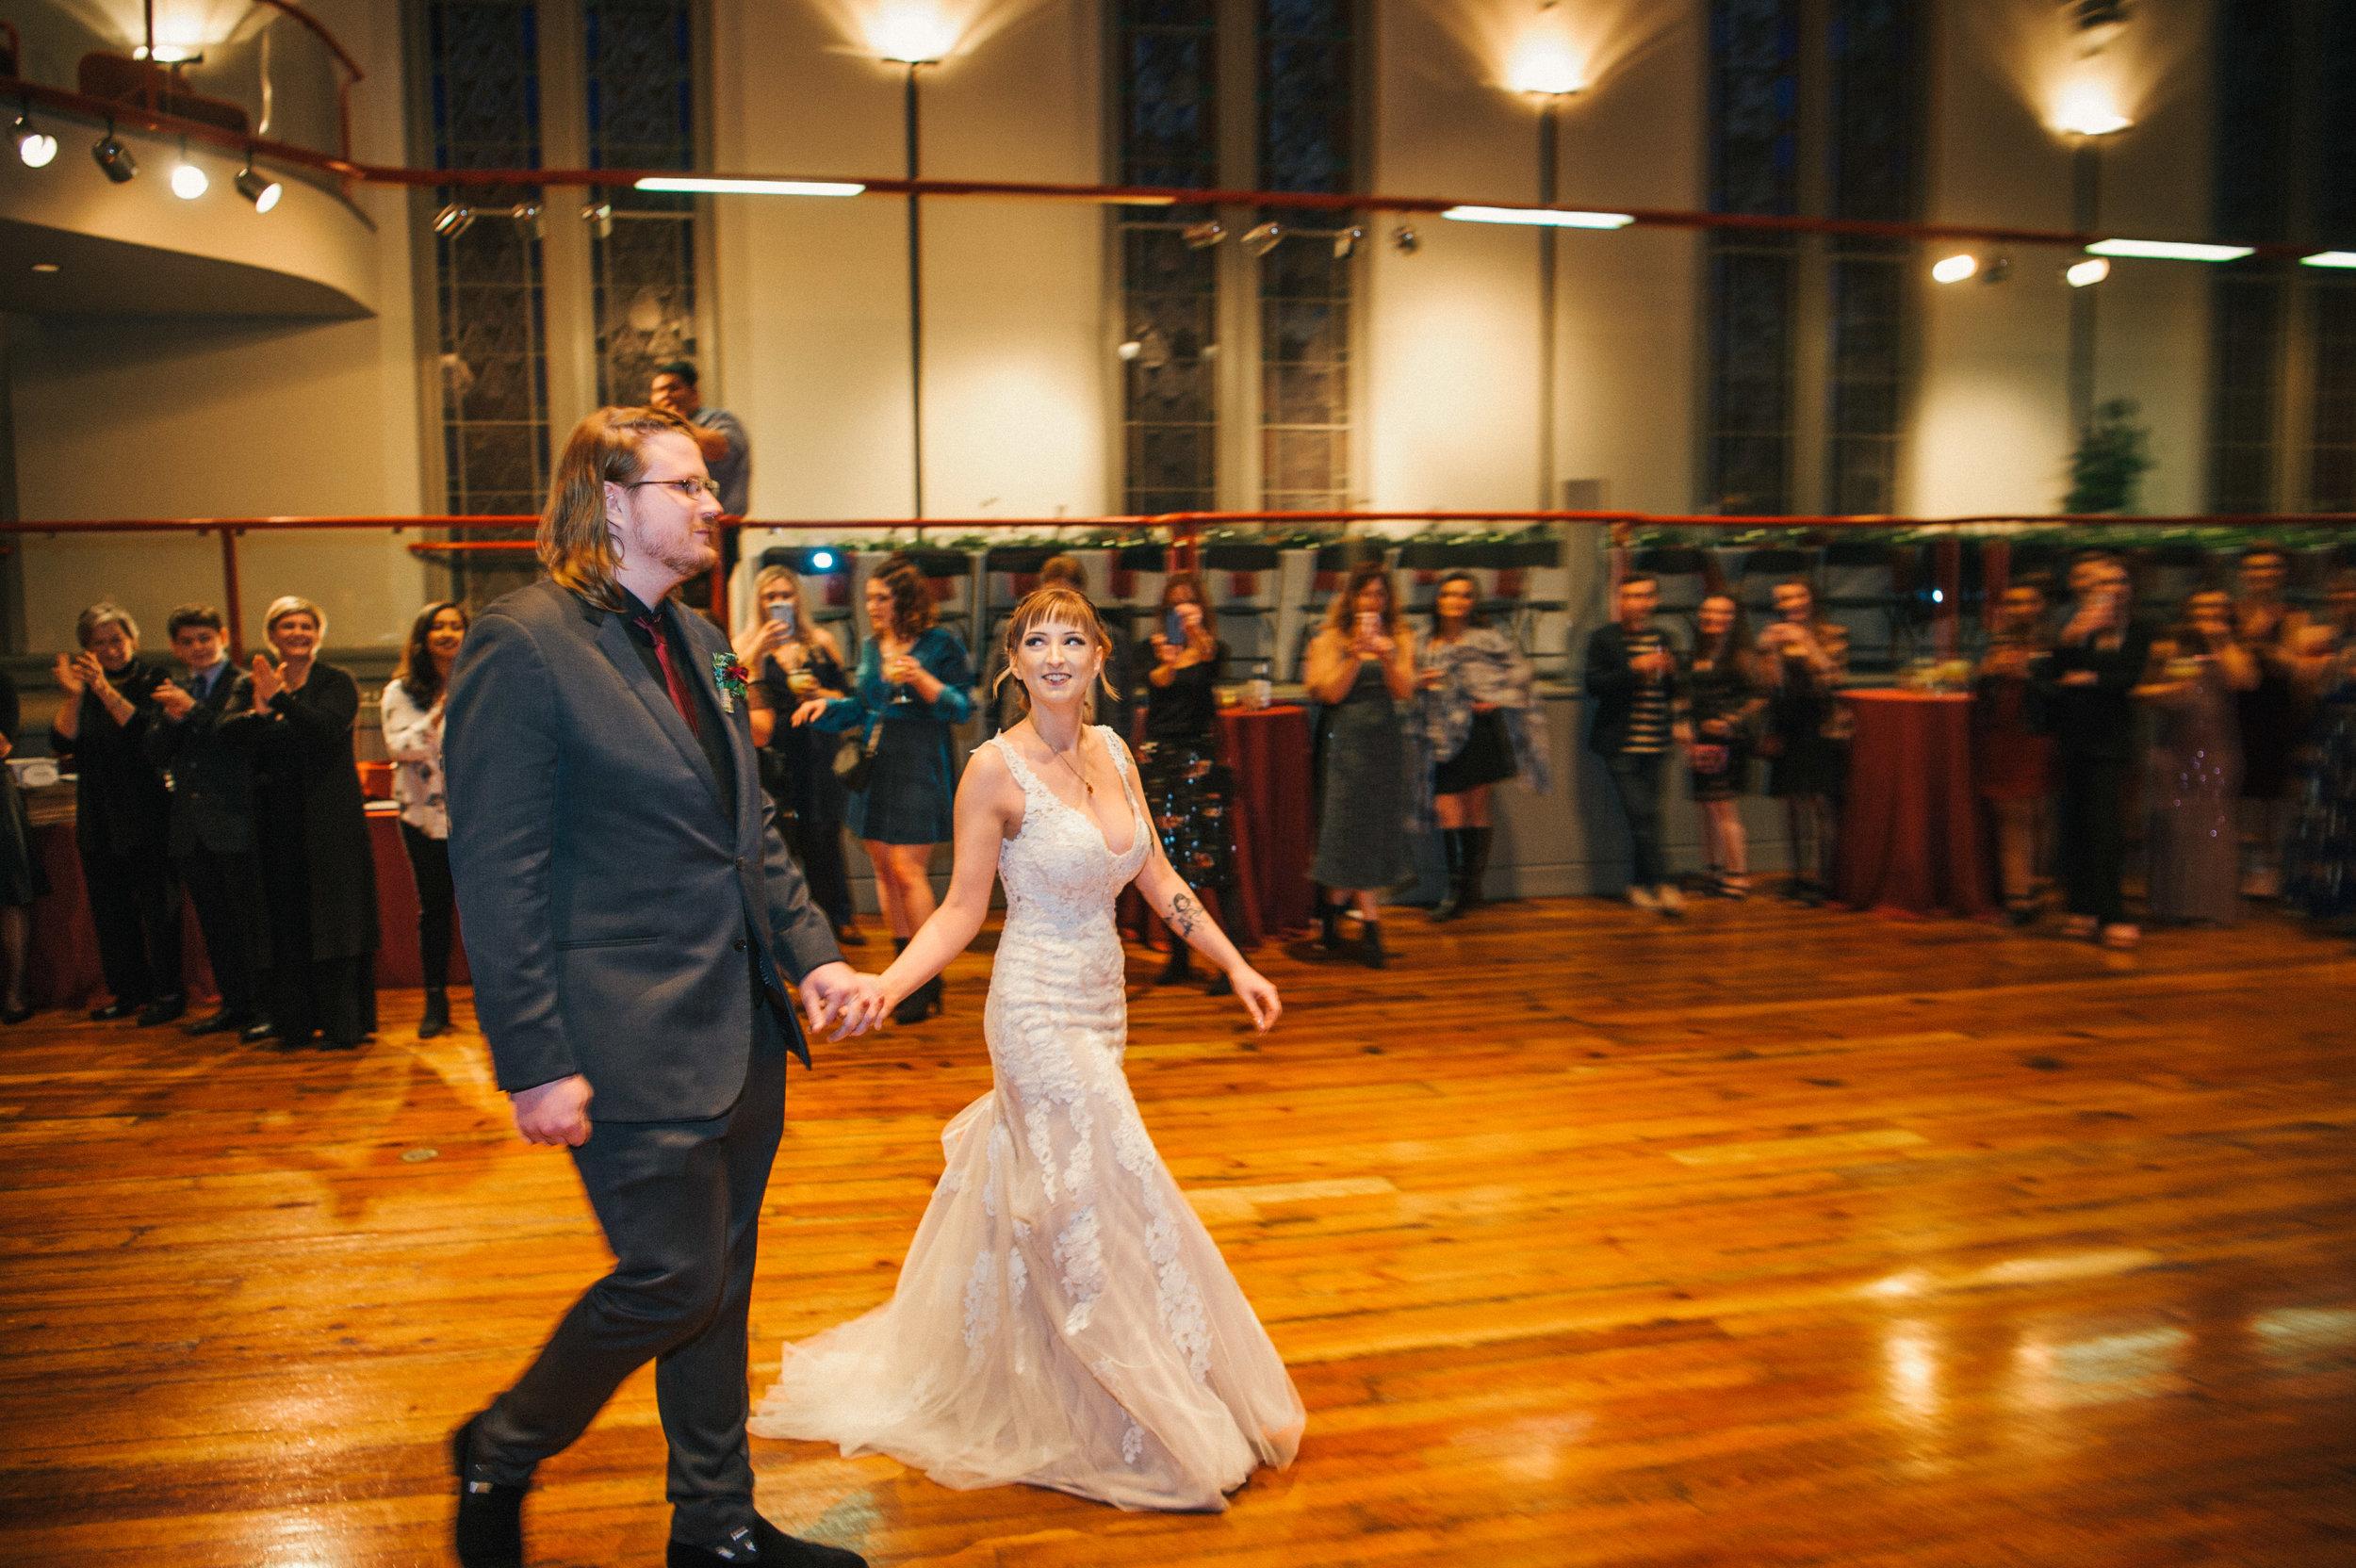 Amber and Kyles Wedding 104.jpg